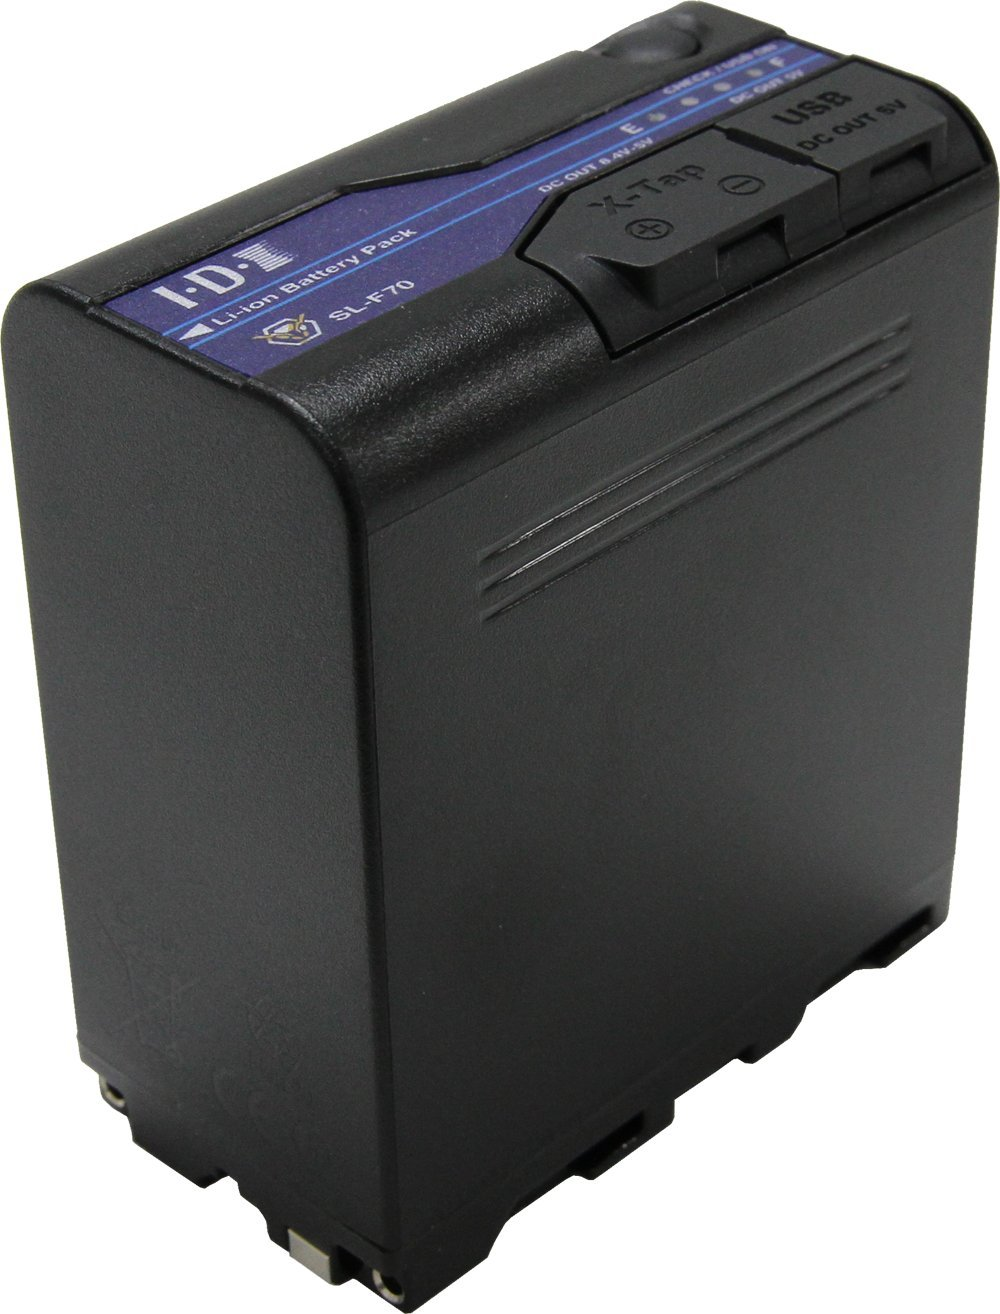 IDX SL-F70 72Wh(7.2V/9.9Ah) Lマウント7.2Vタイプリチウムイオンバッテリー   B07F3JWLPD